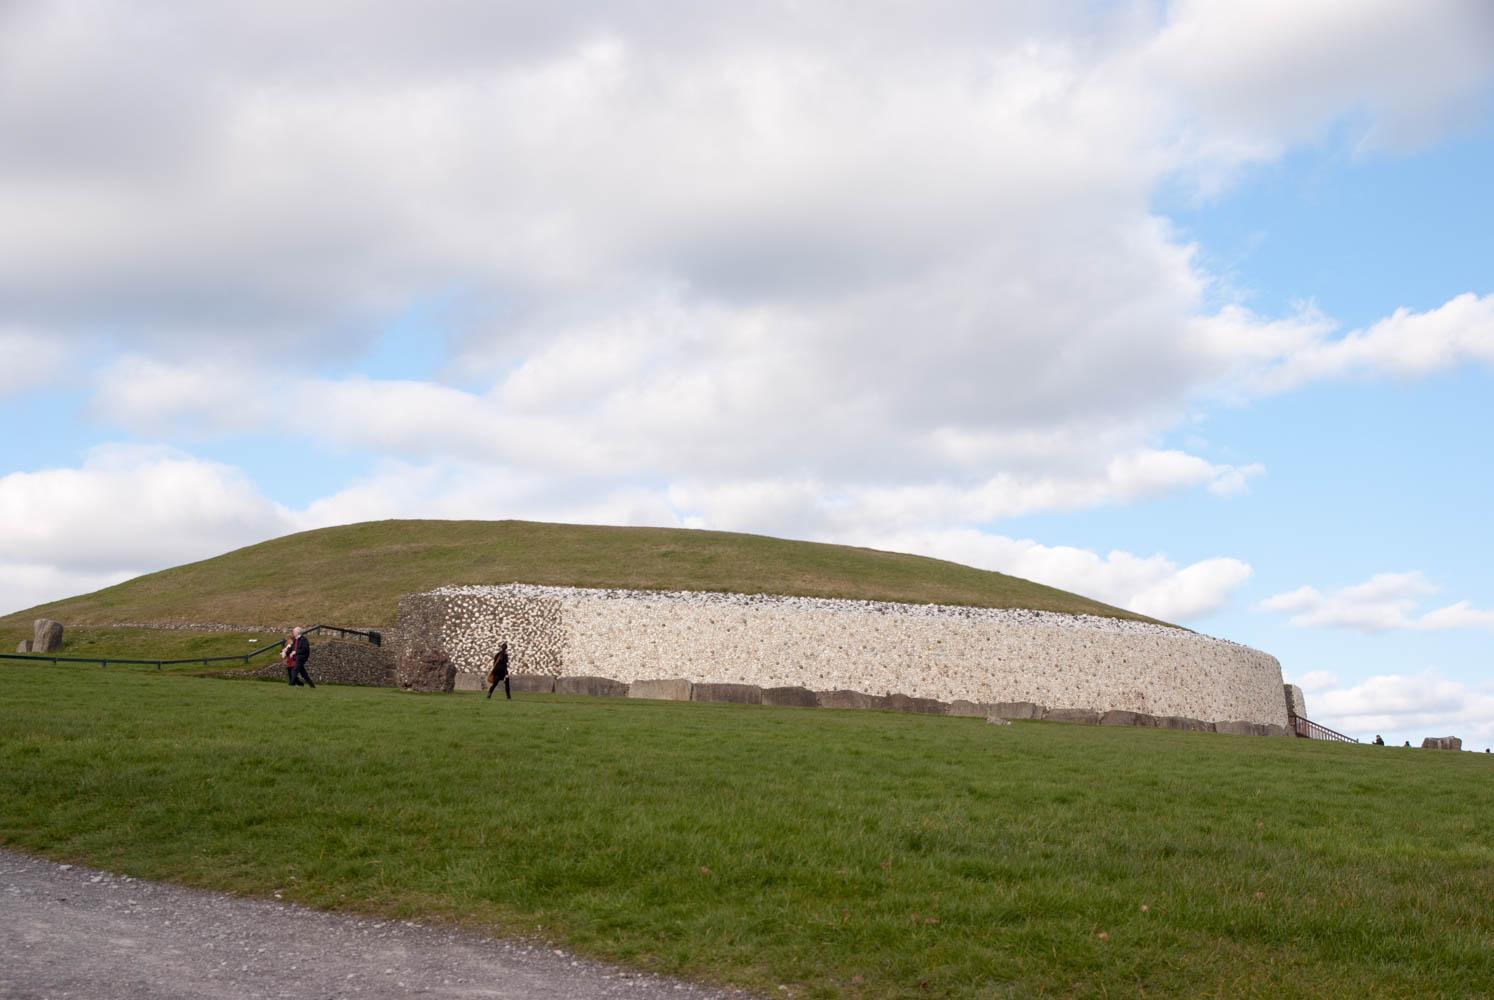 The mound at Newgrange